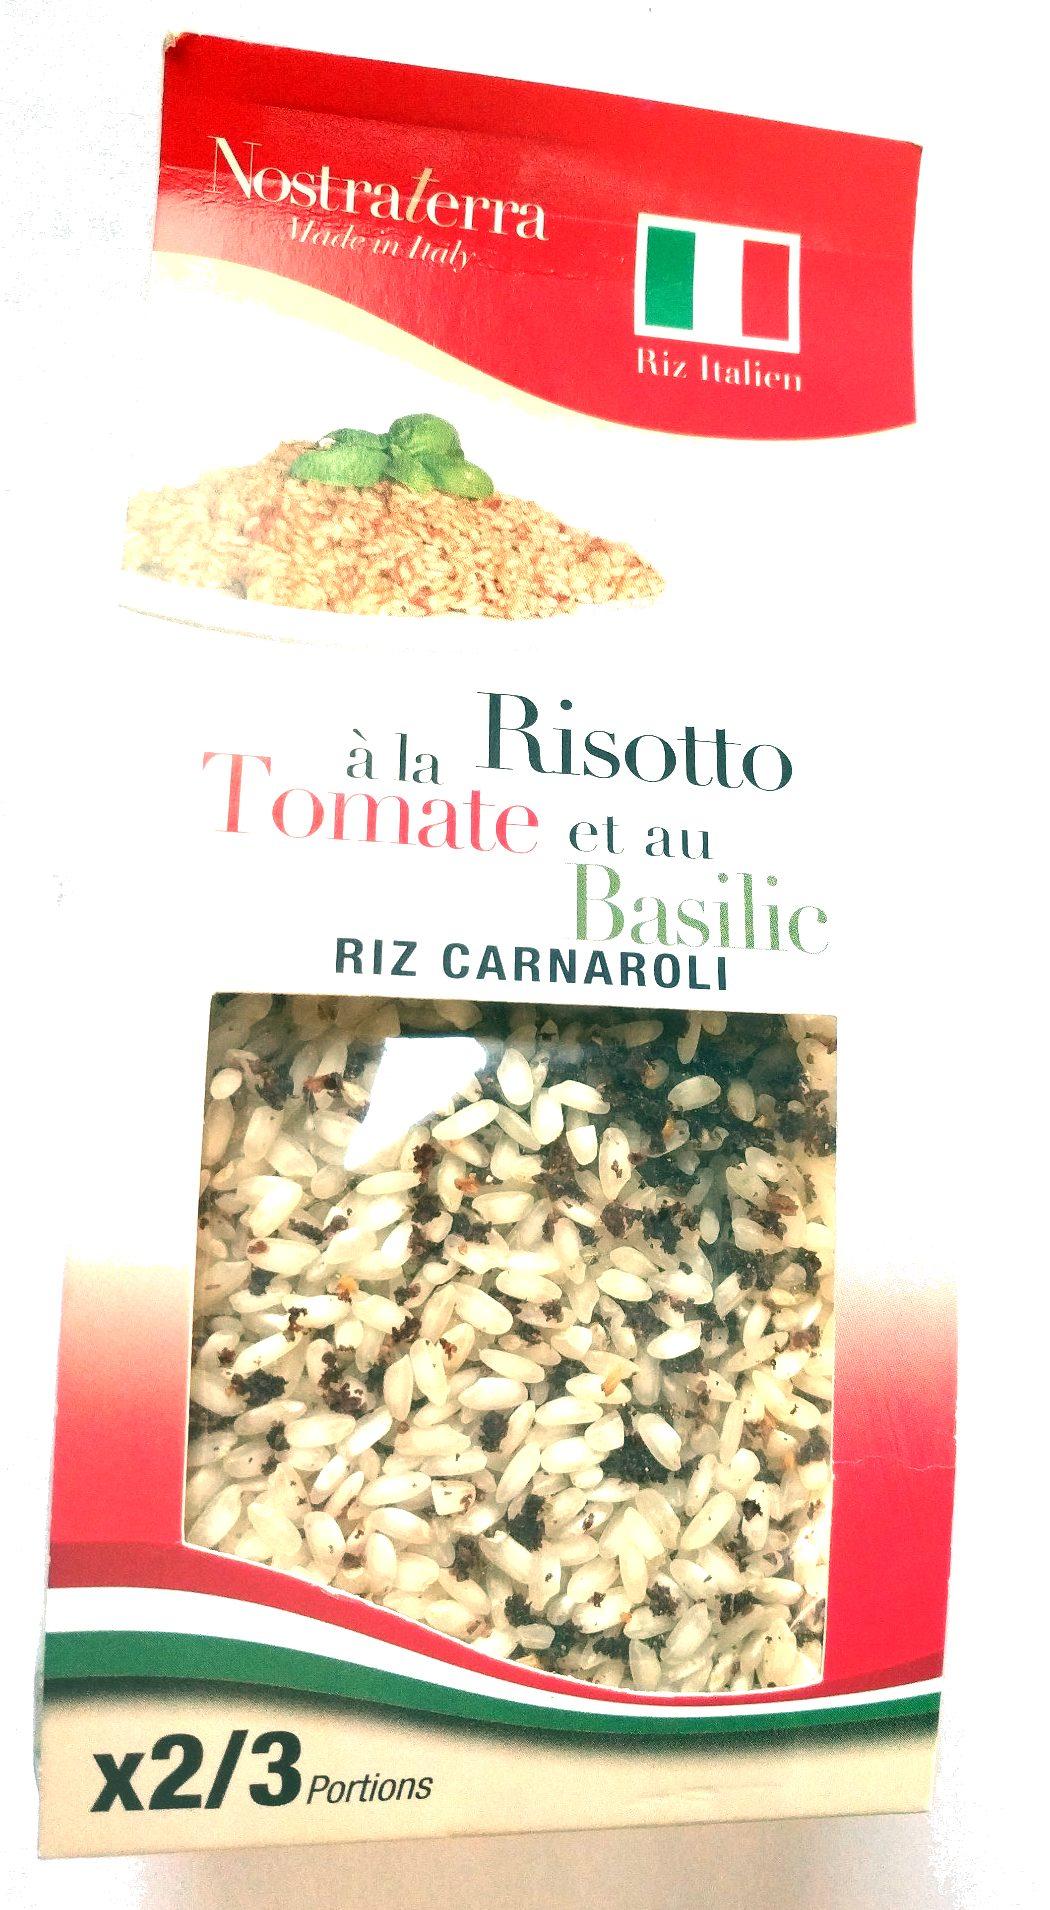 Risotto à la tomate et au basilic riz carnaroli - Produit - fr